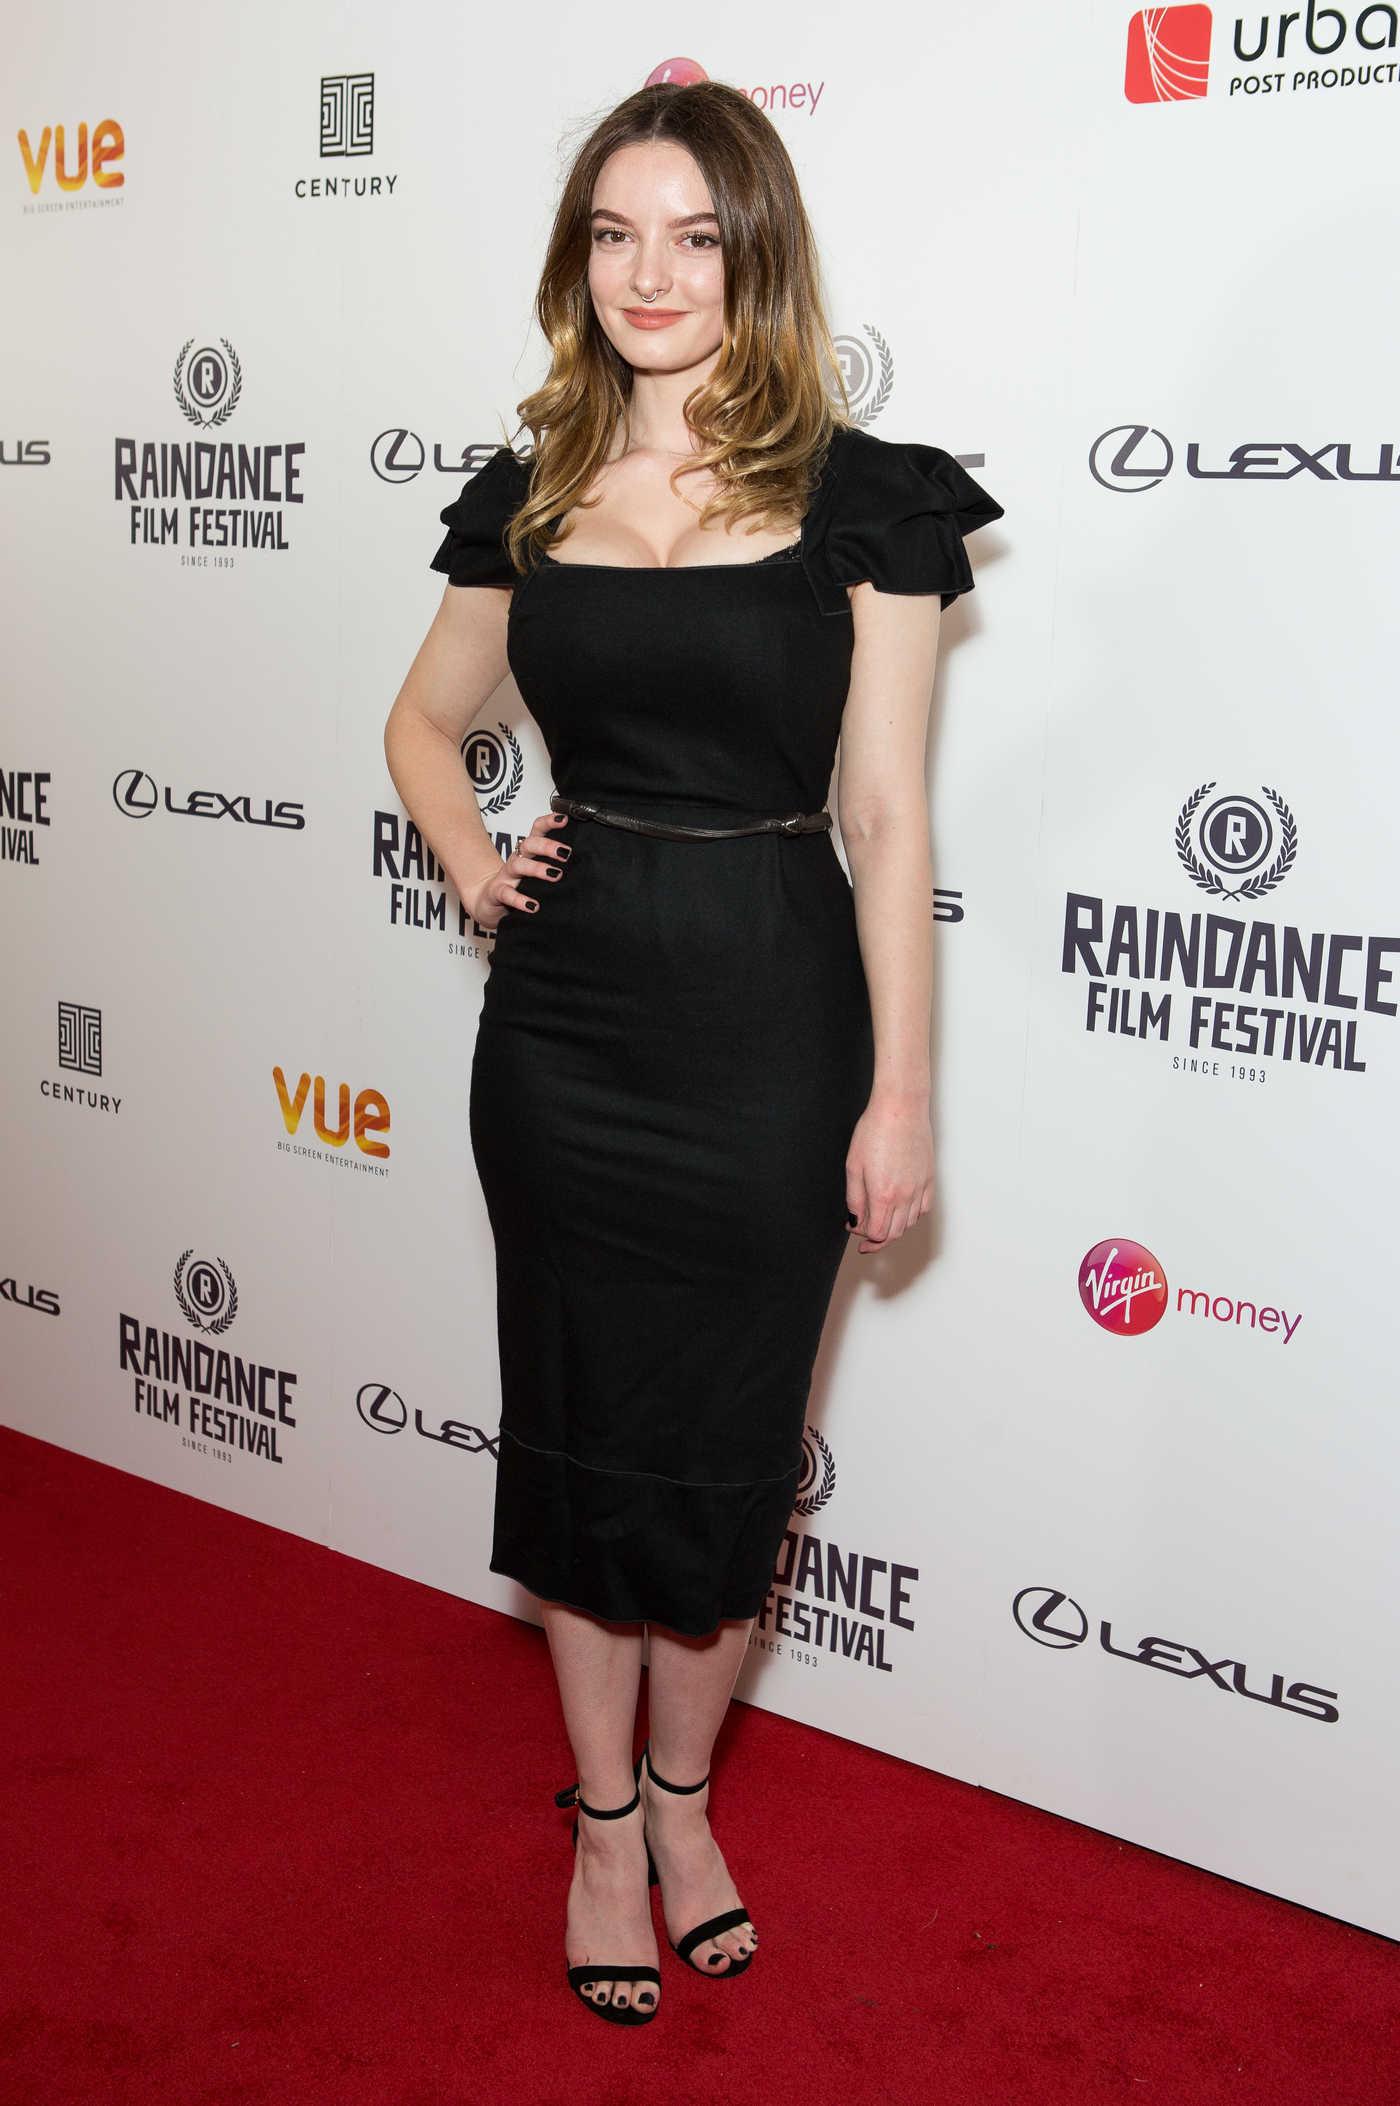 Dakota Blue Richards at Raindance Film Festival Opening Gala in London 09/20/2017